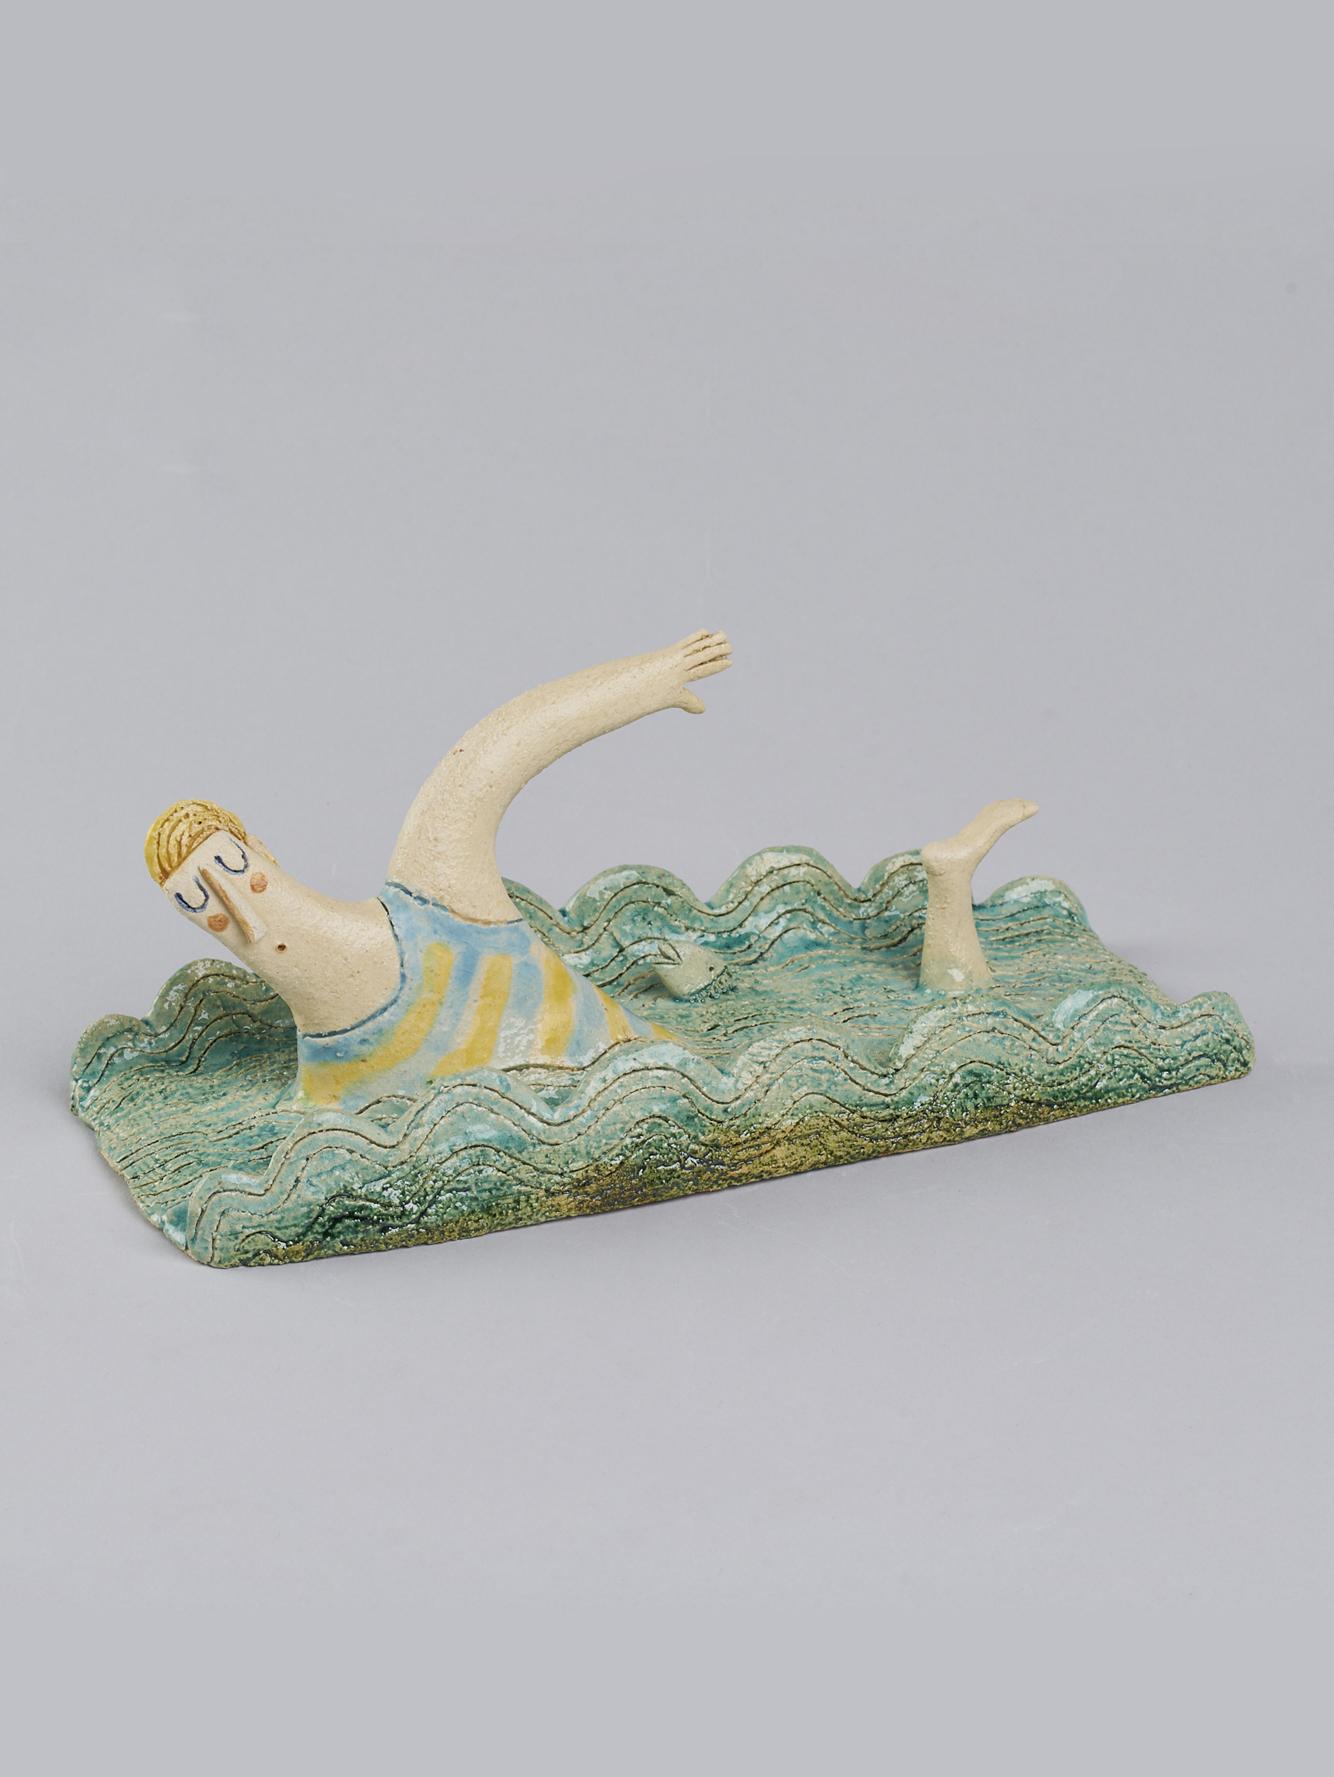 Nuotatore IV